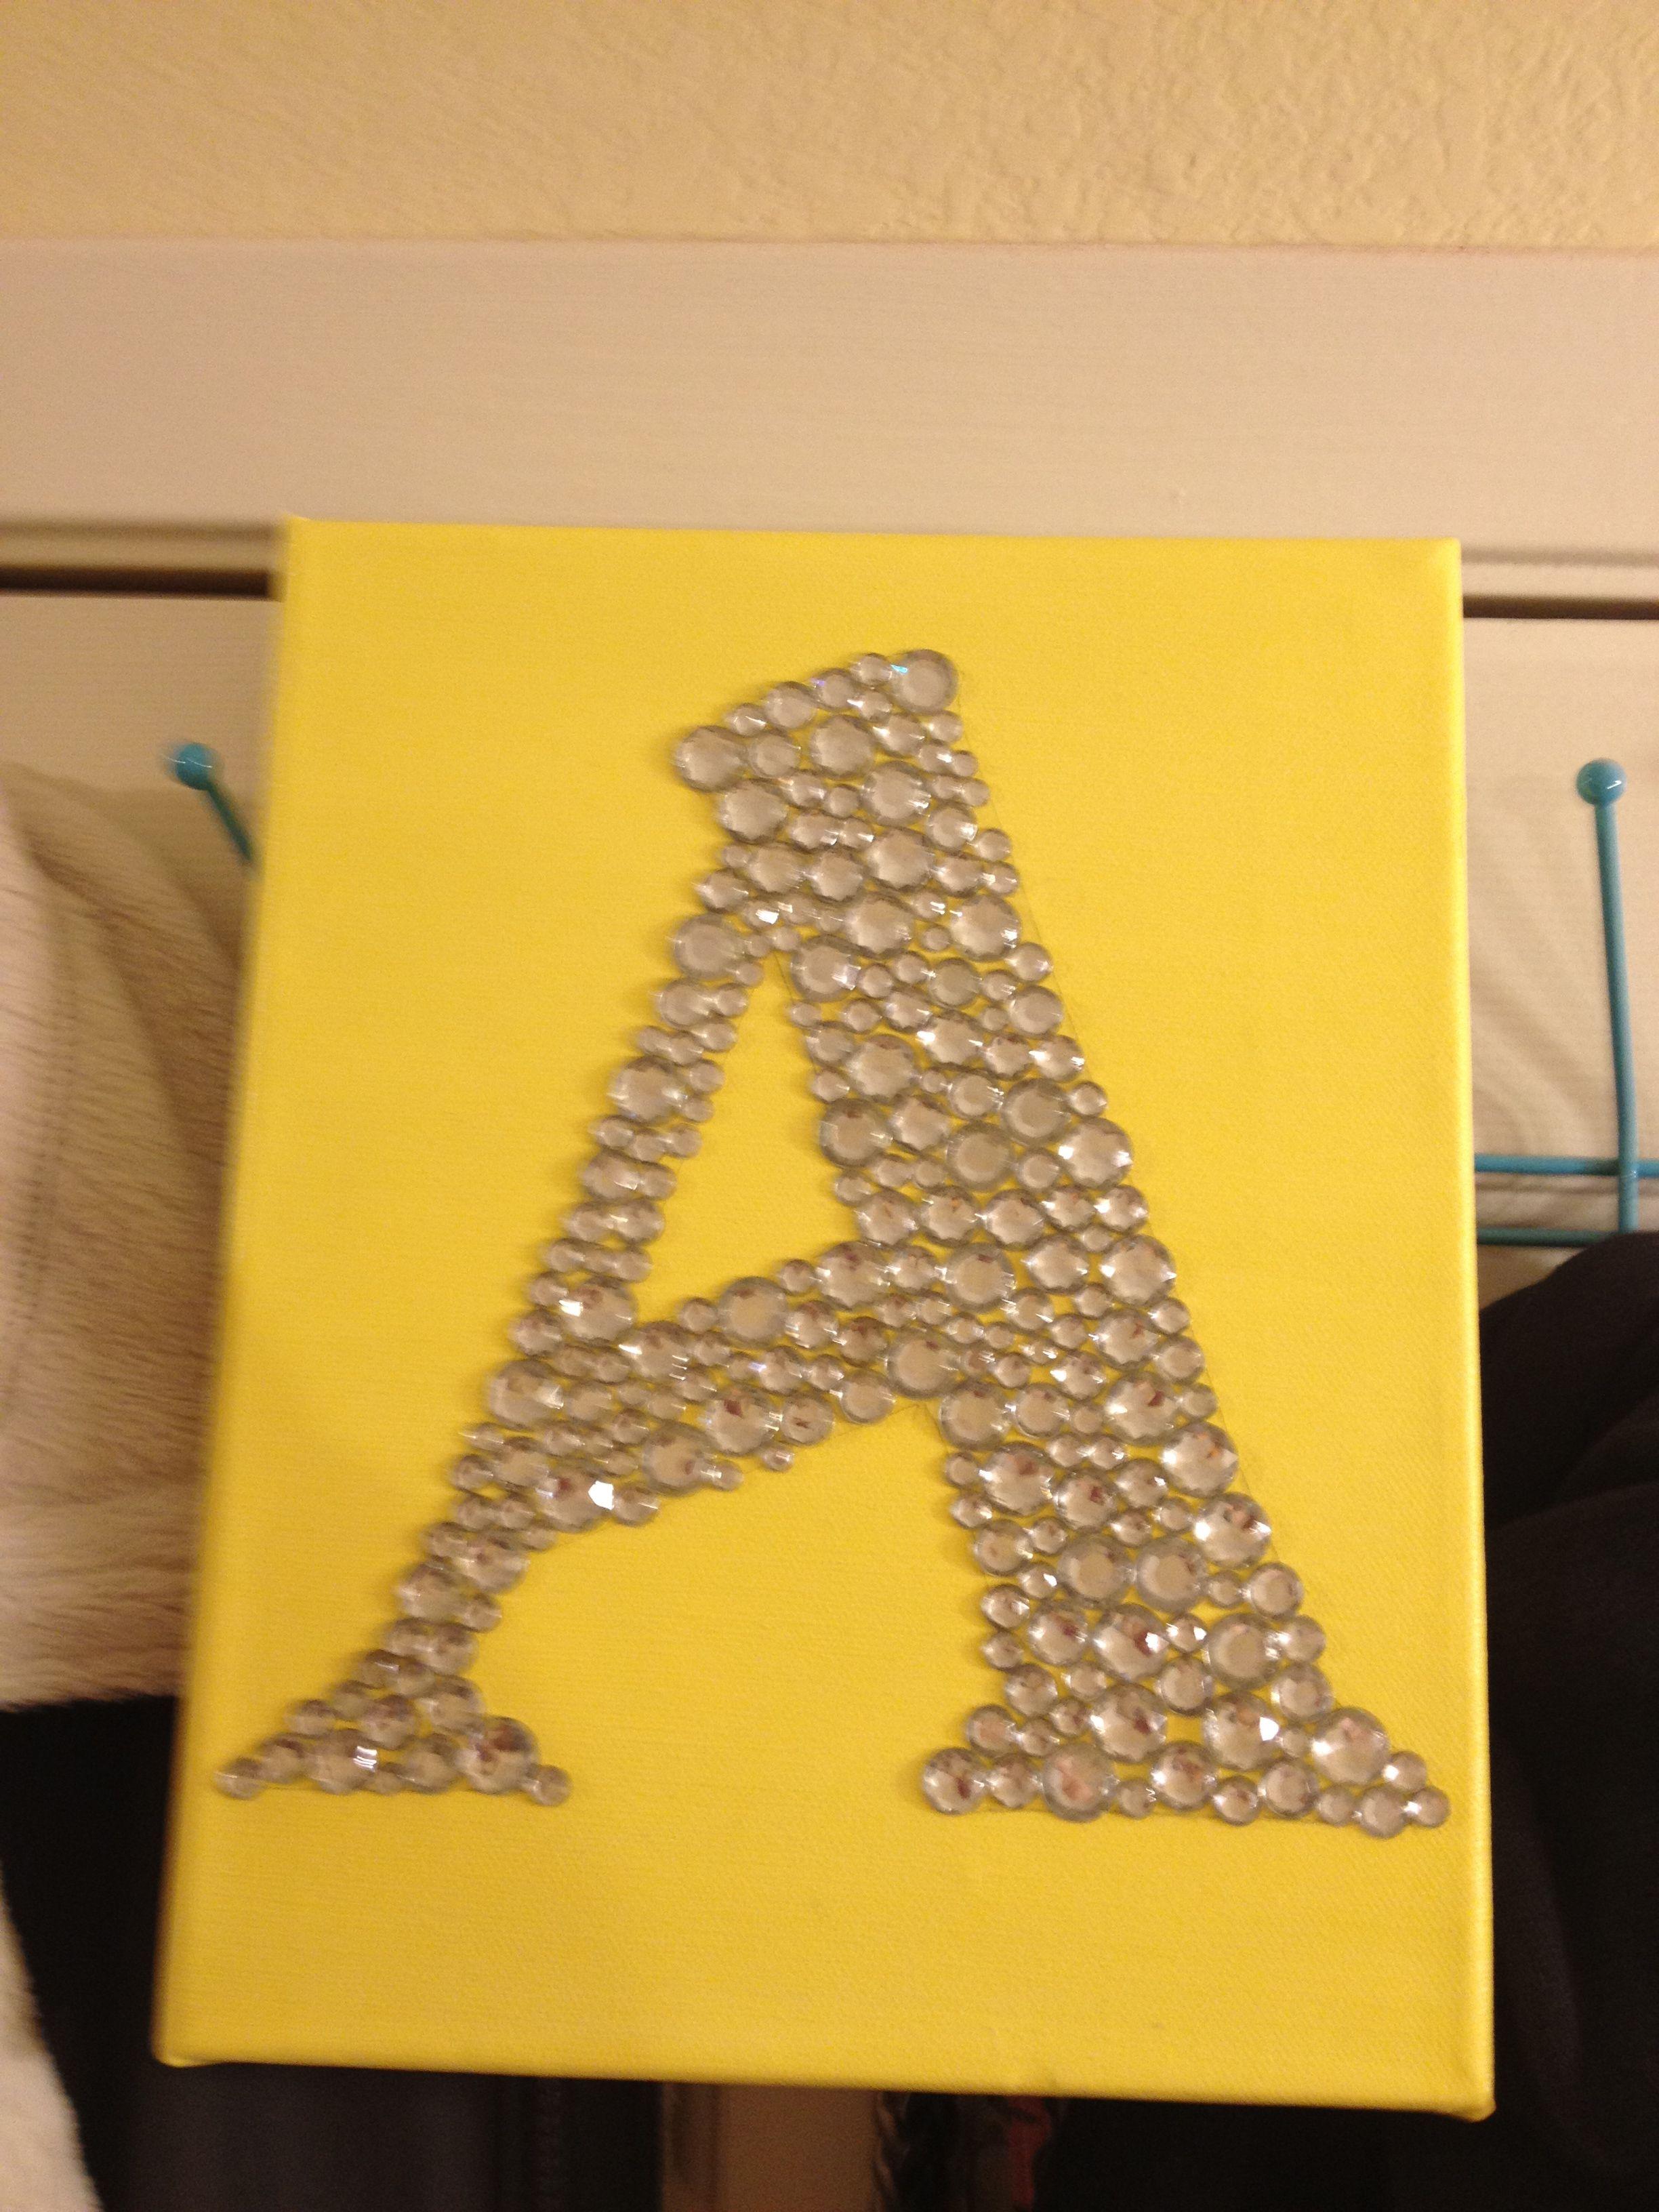 Paint canvas. Trace letter. Mod podge rhinestones! | Crafty ...